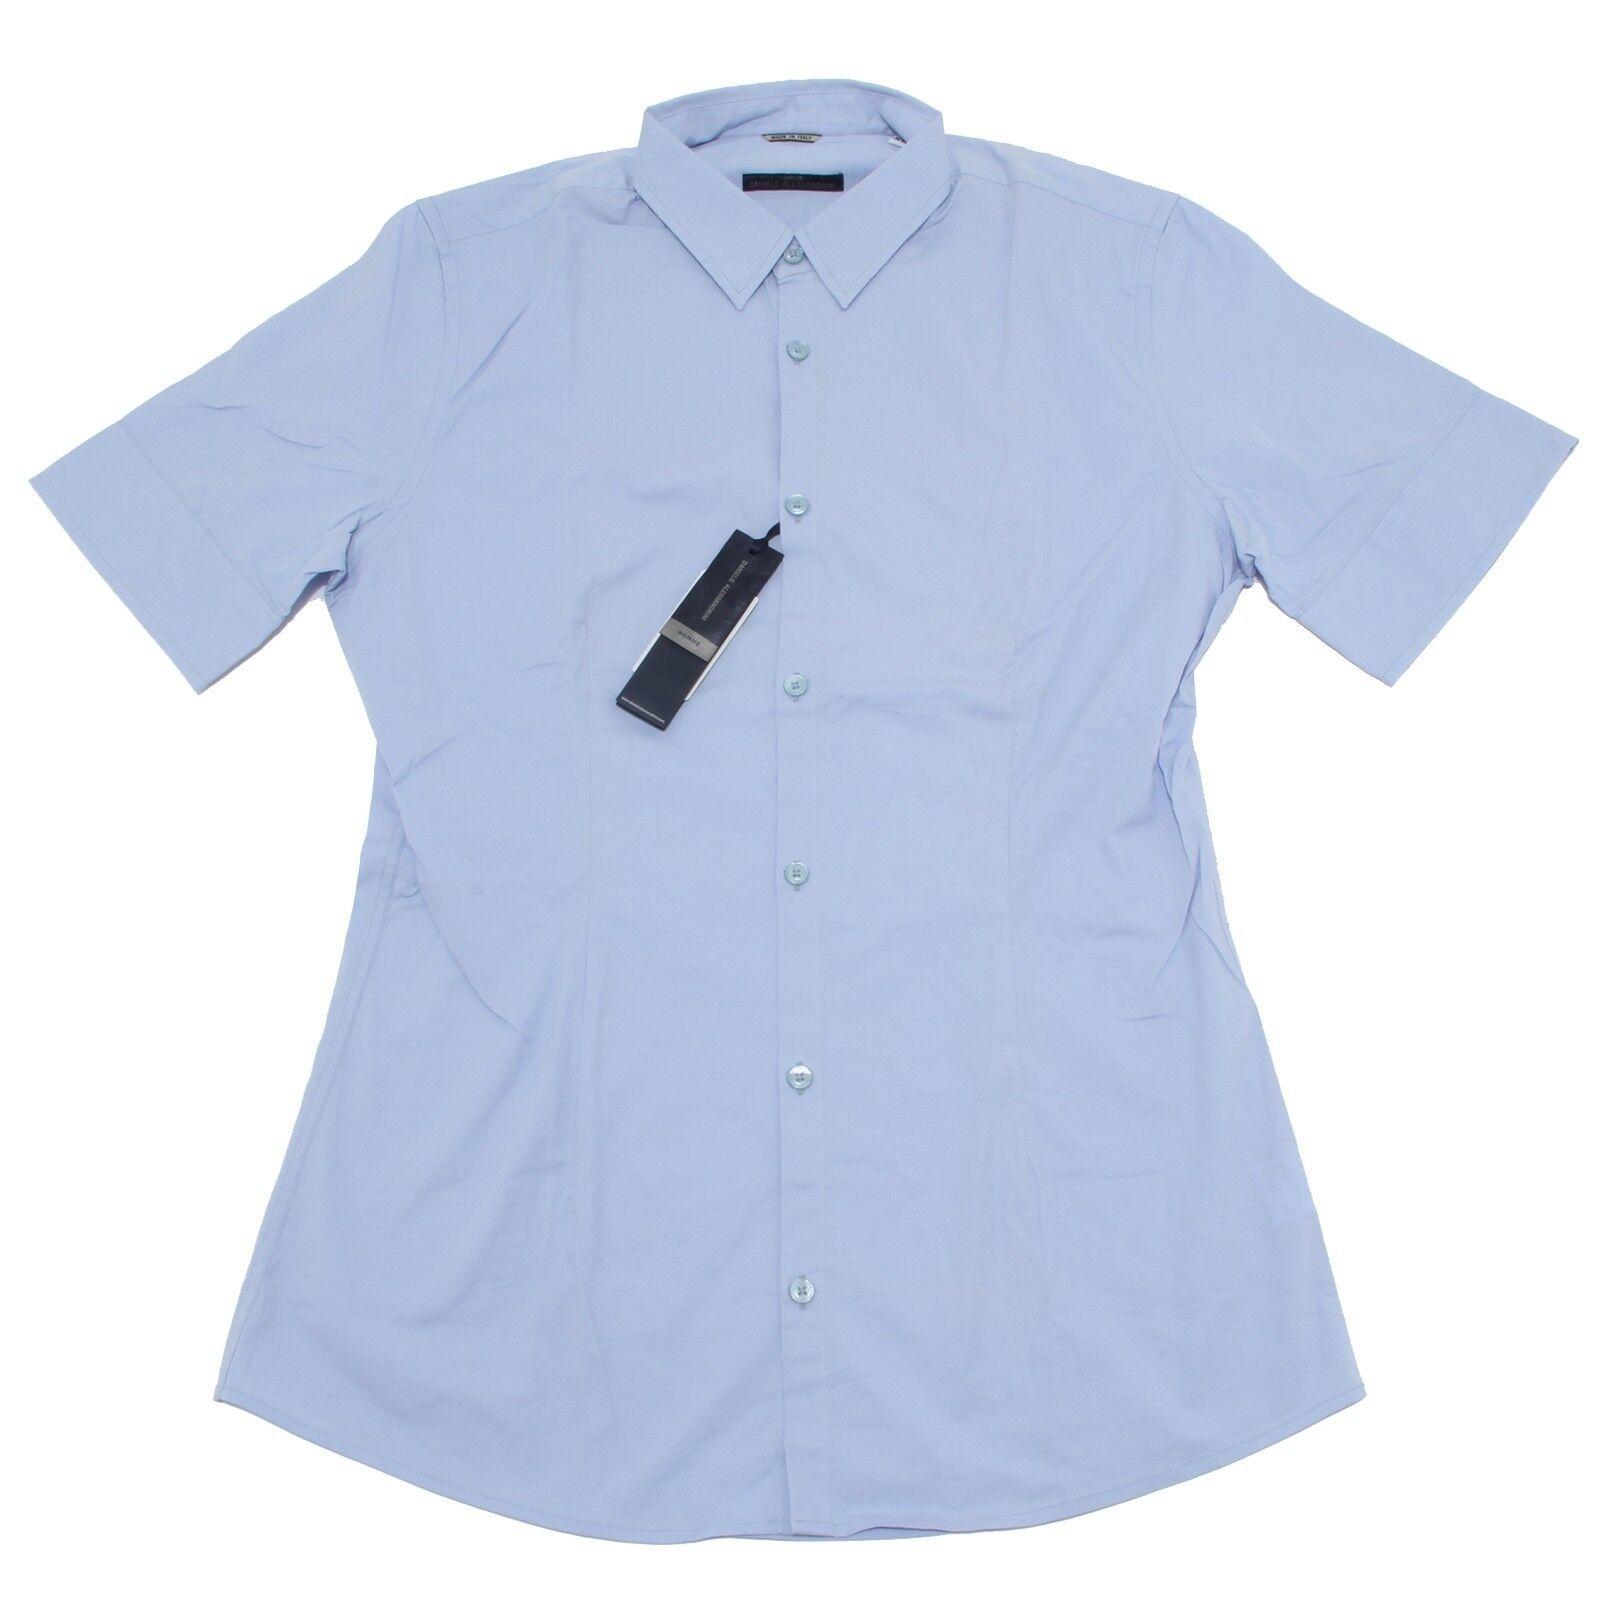 8199 camicia short sleeve DANIELE ALESSANDRINI  camicie uomo shirt men